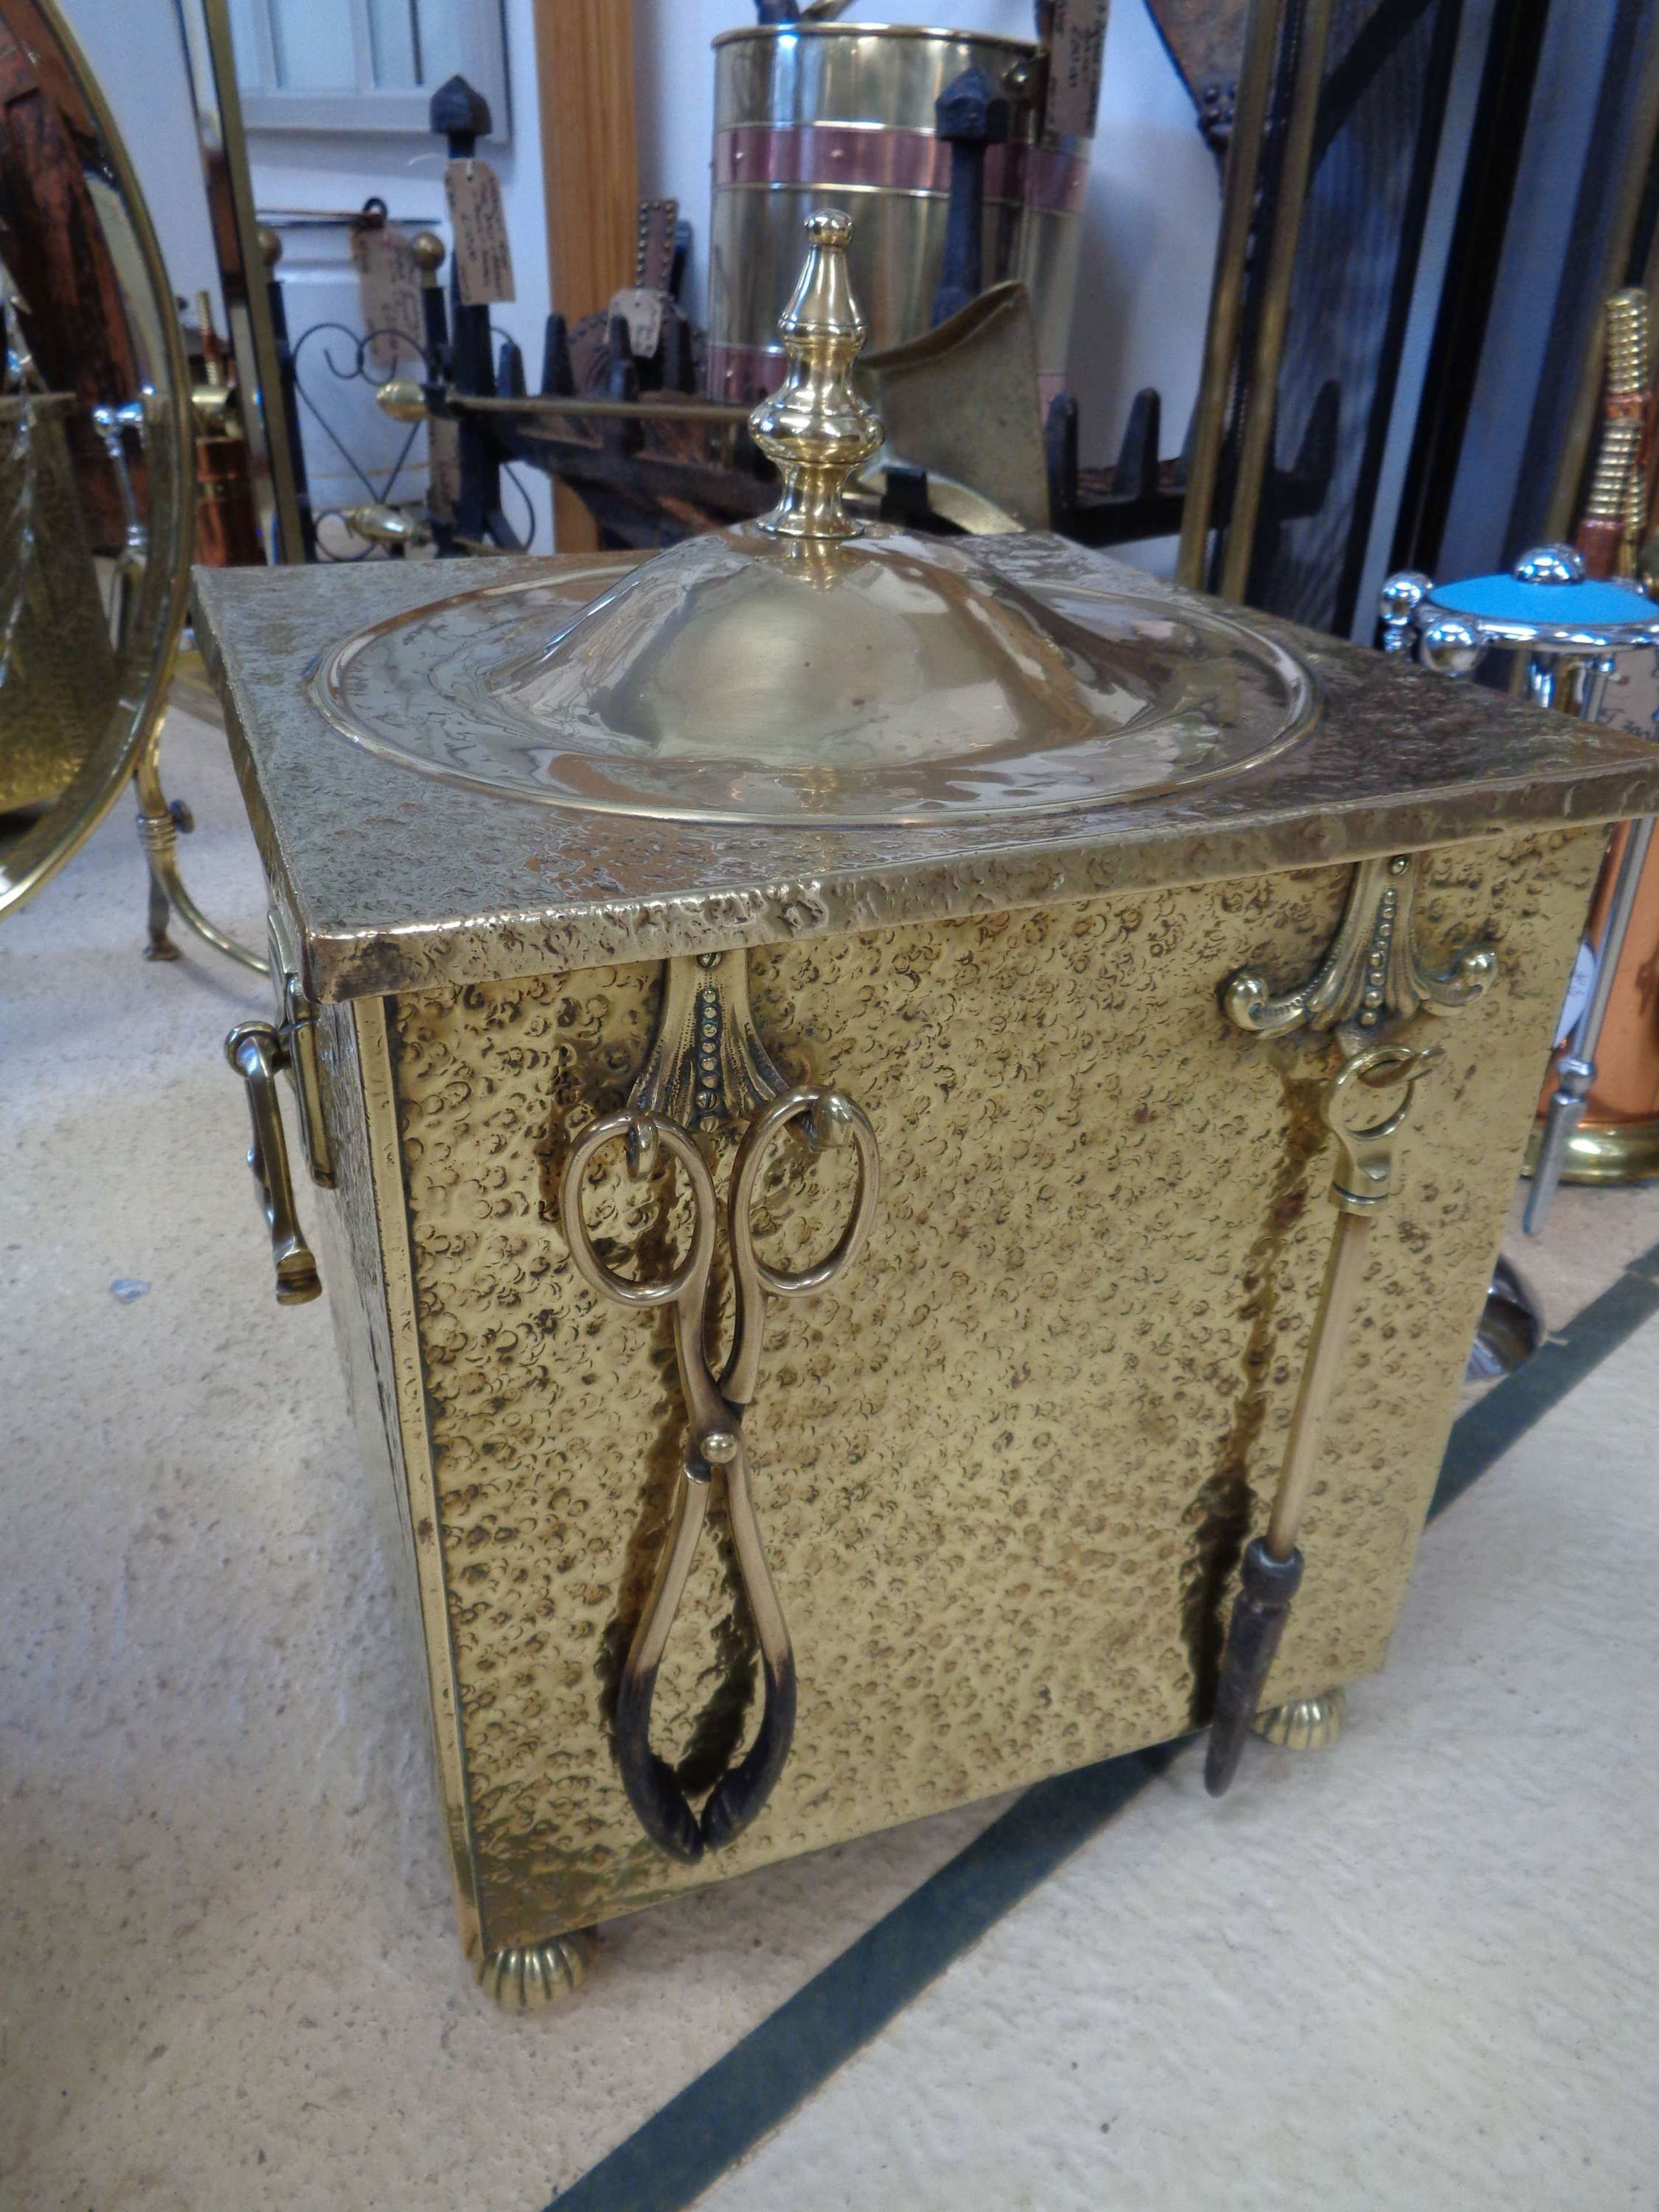 Antique Brass Coal Bucket, Lid, Tools & Original Liner